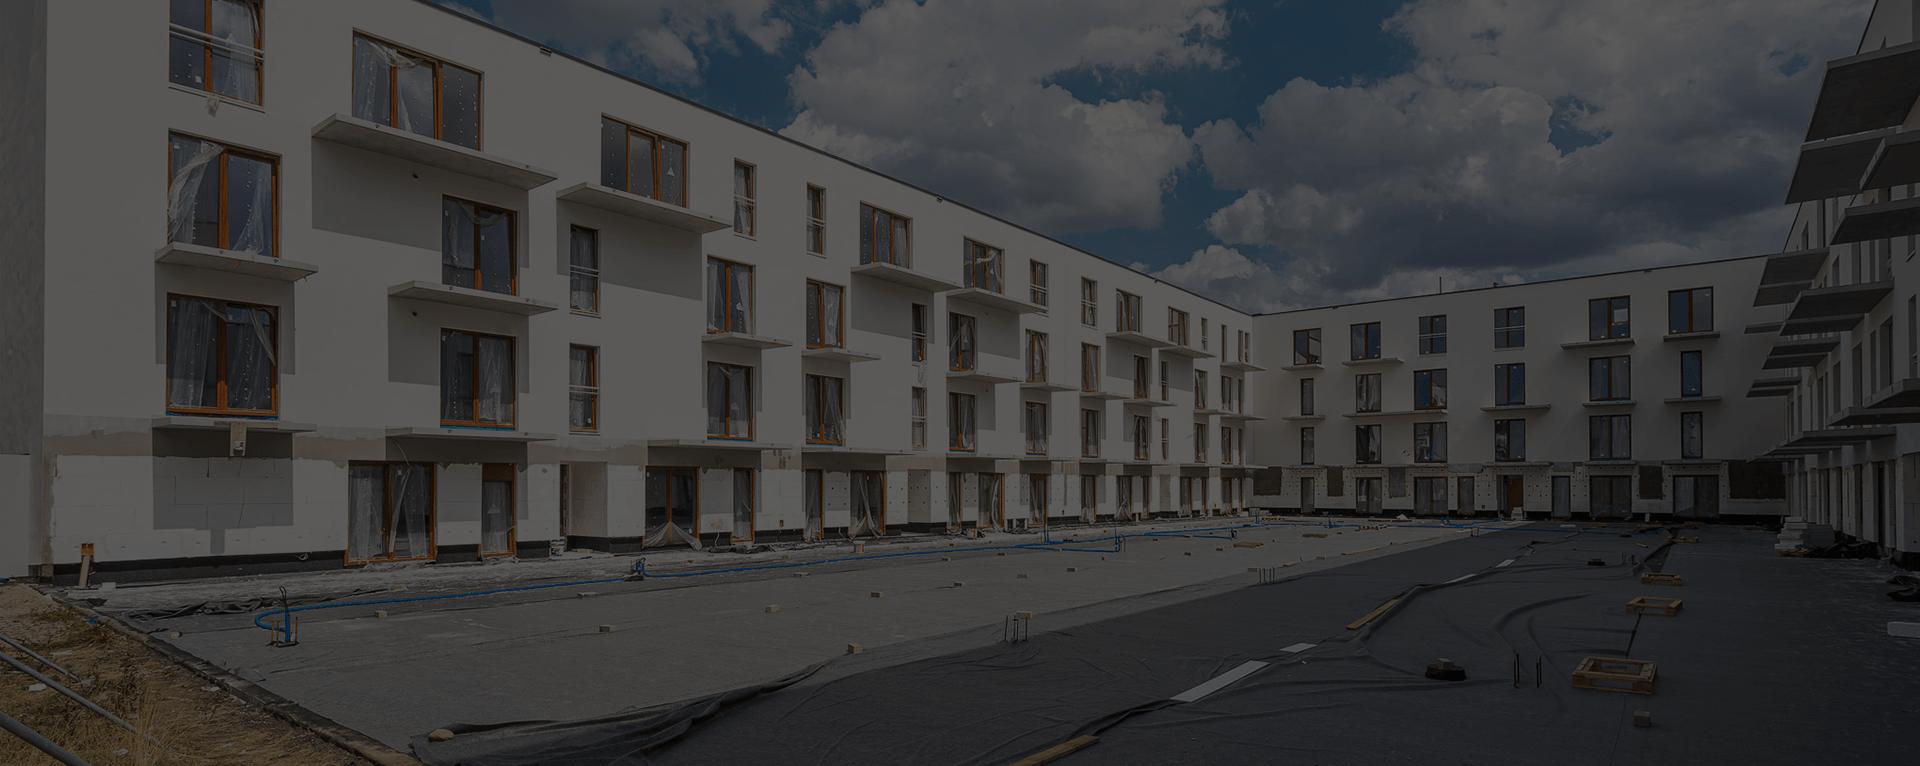 SuperNova - postępy w pracach budowlanych - 1